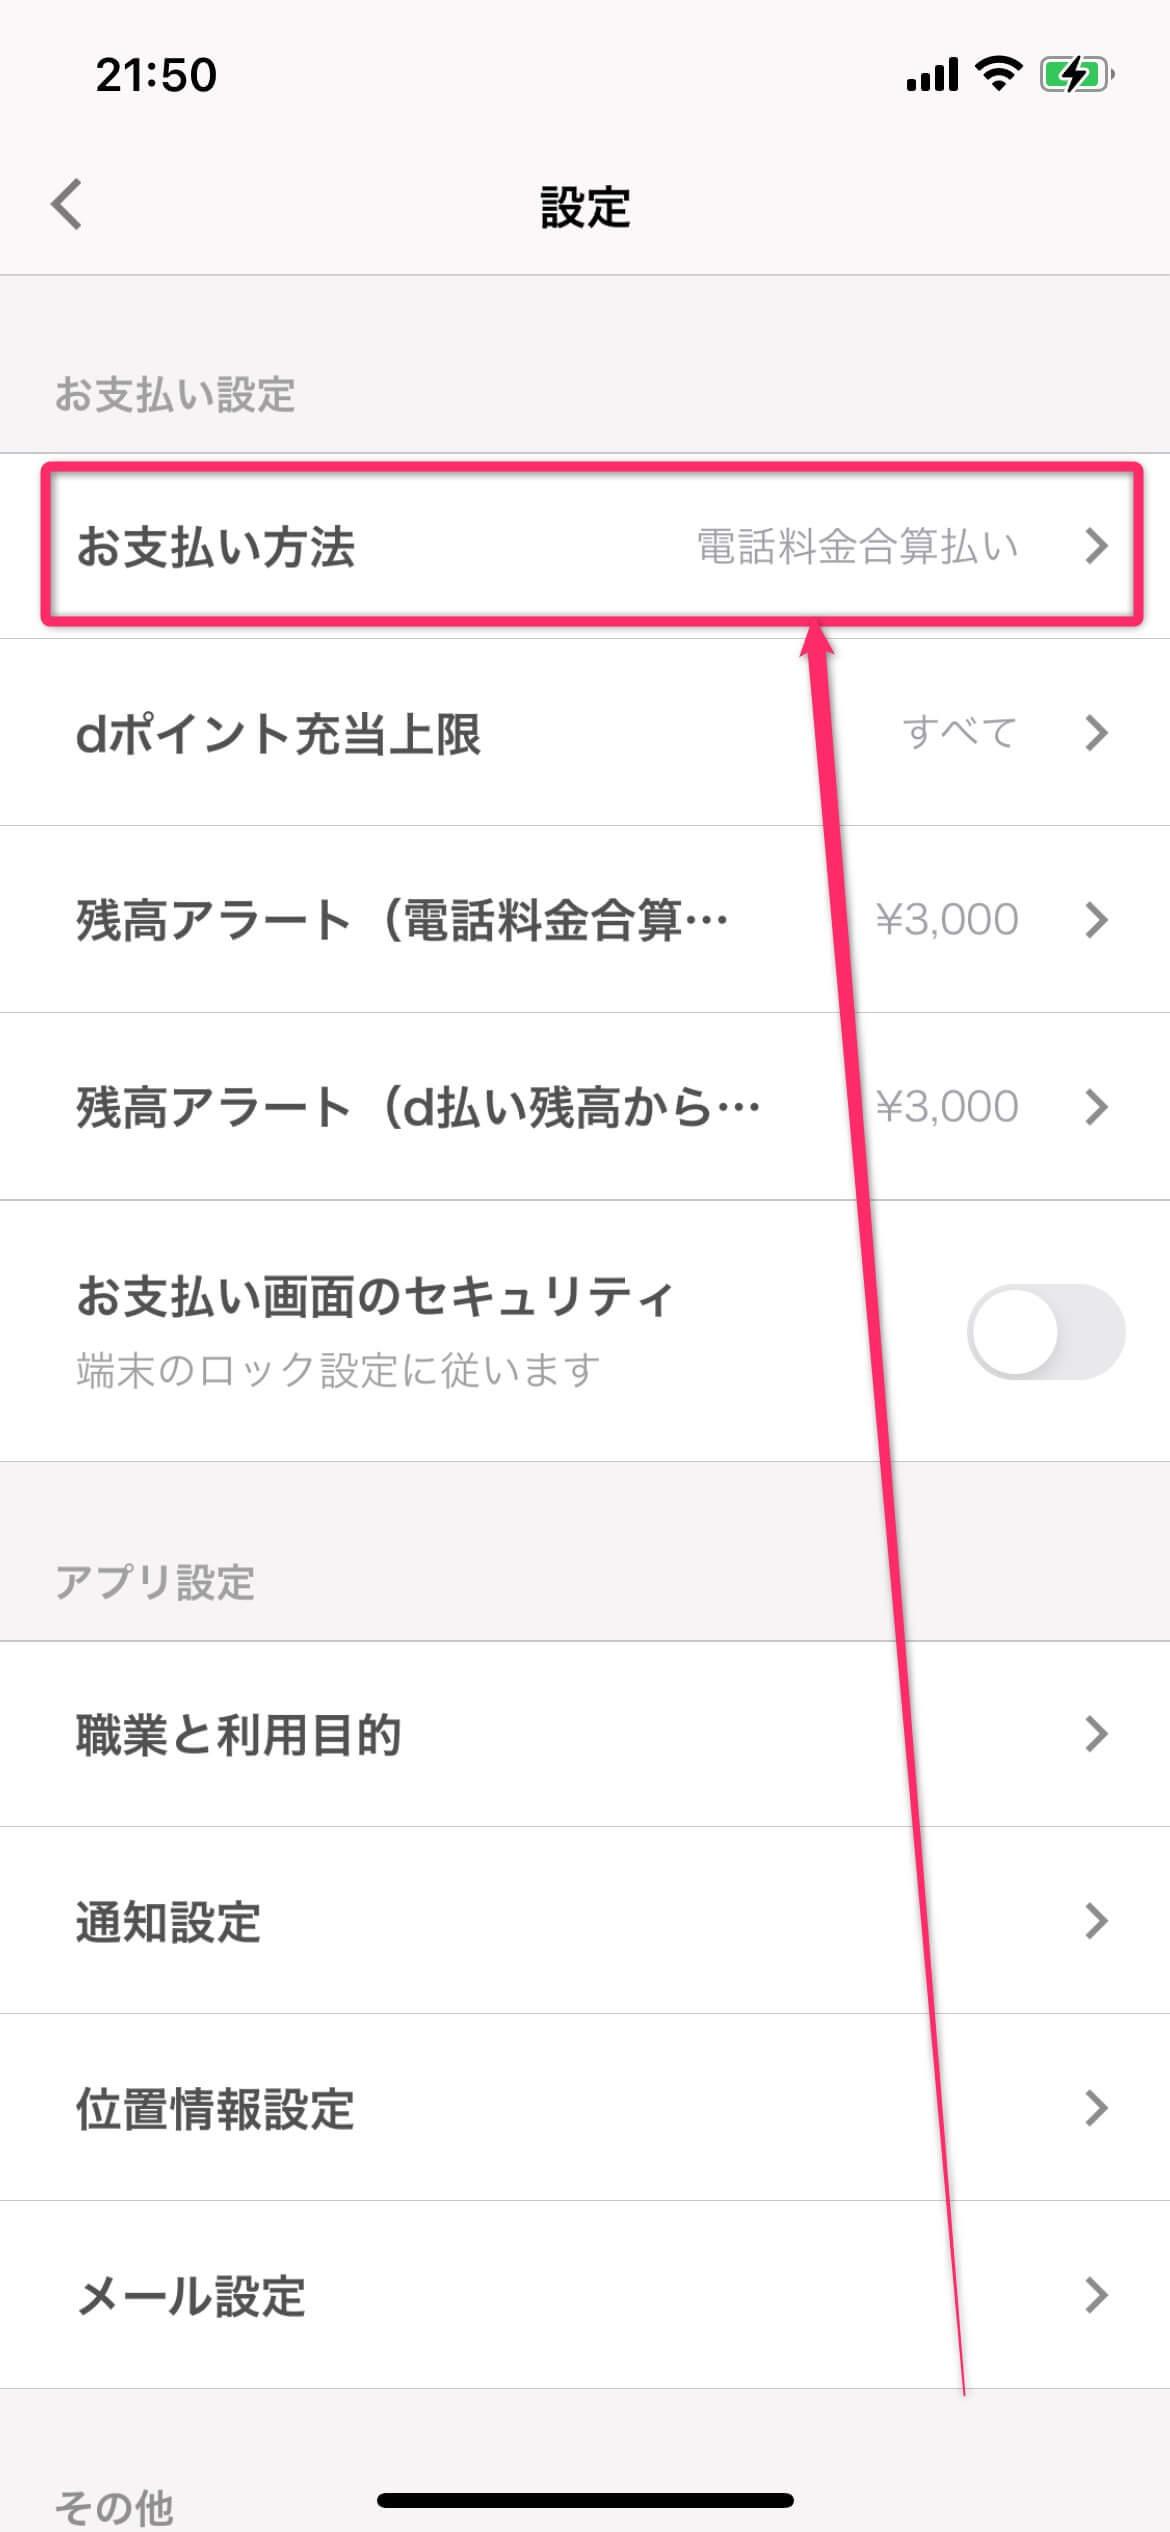 d払い支払い方法4